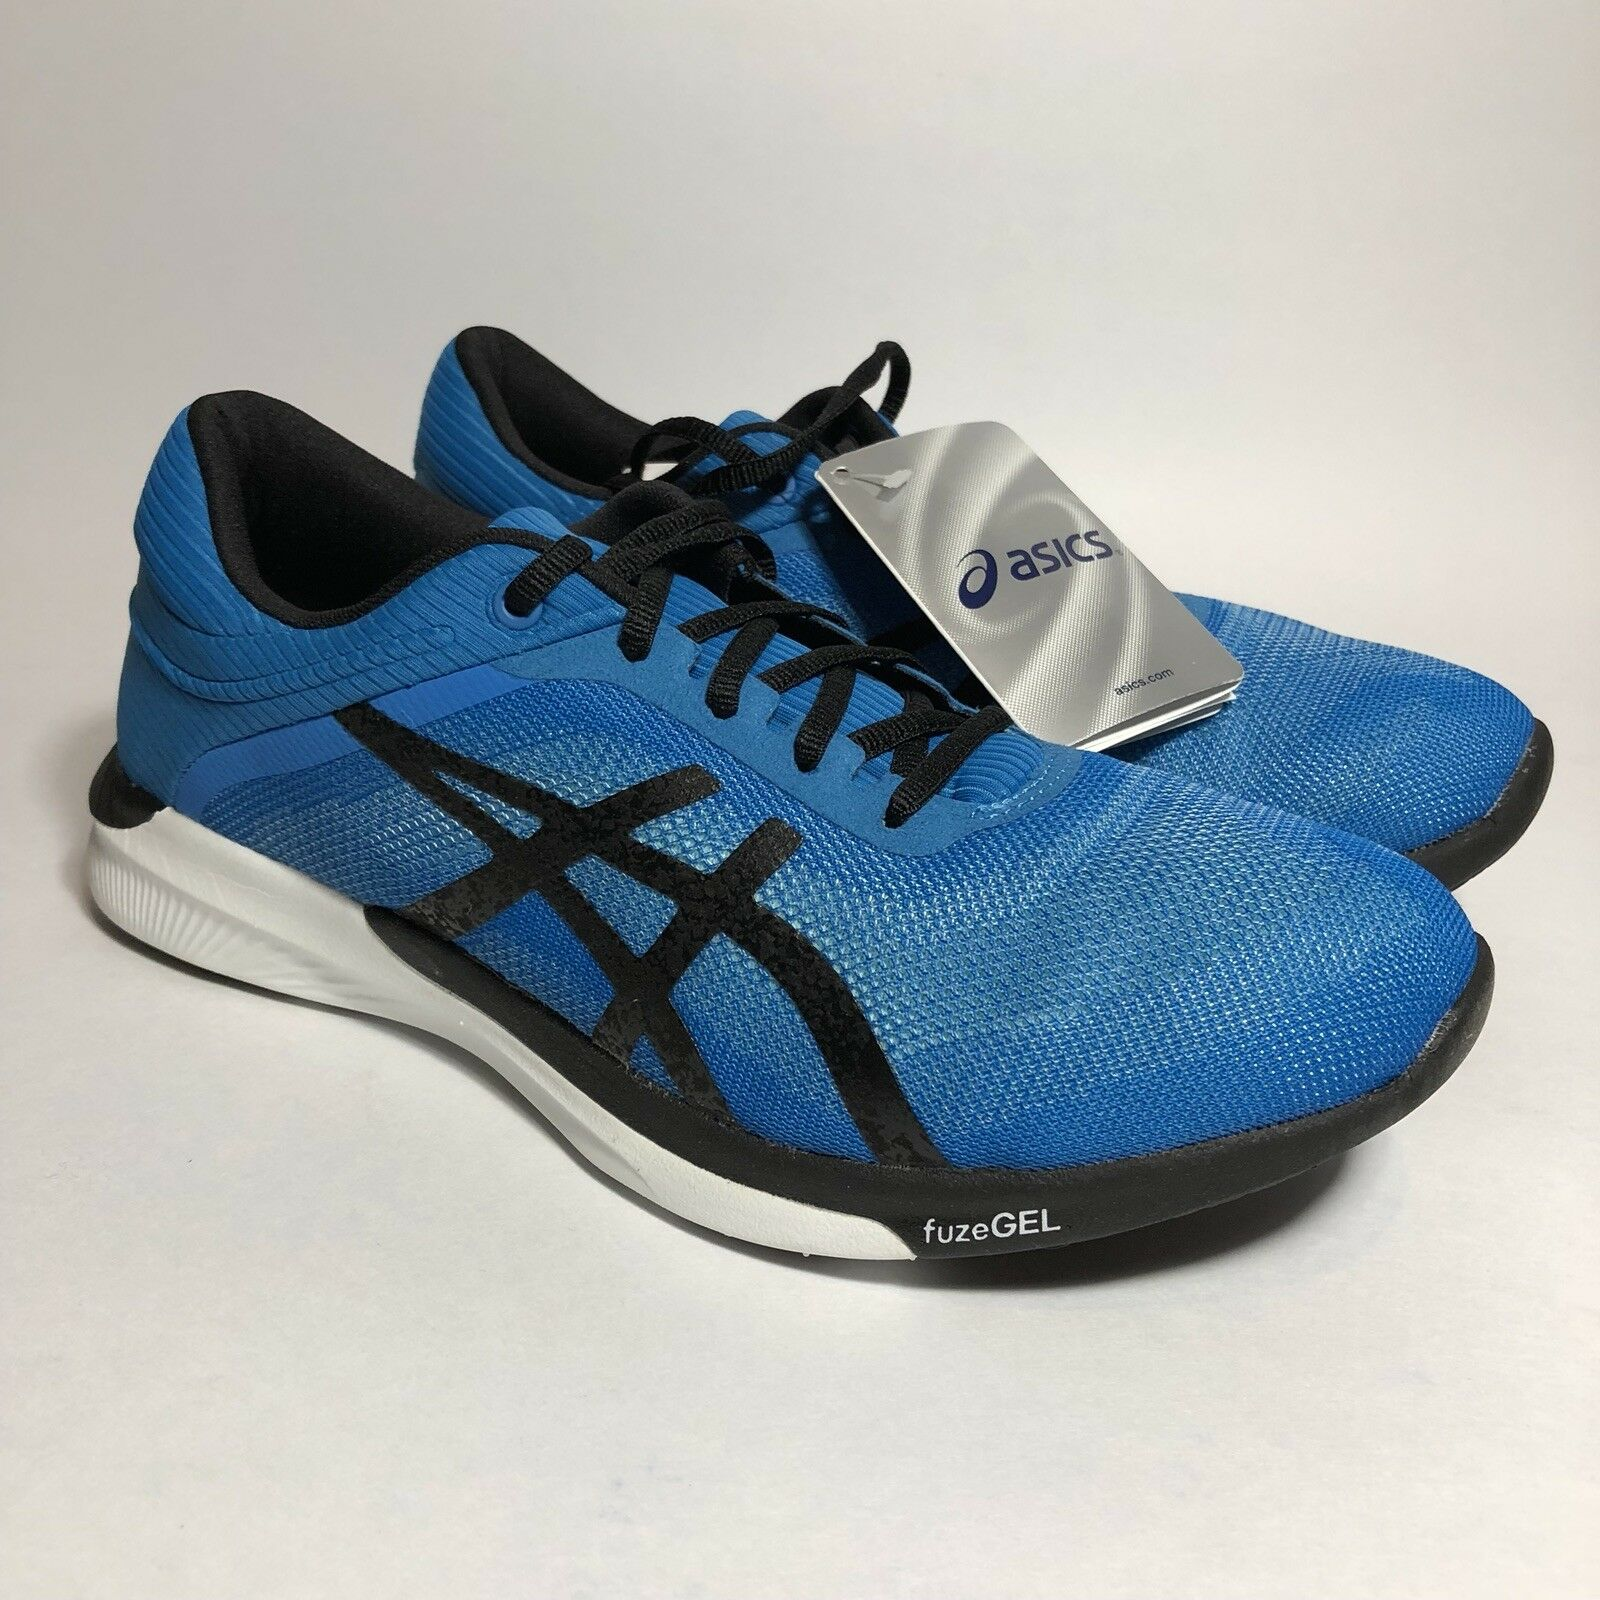 Asics Fuzex T718N6790 Rush Mens Running Shoes T718N6790 Fuzex 6 Aqua Splash Black Diva Blue 106bdd